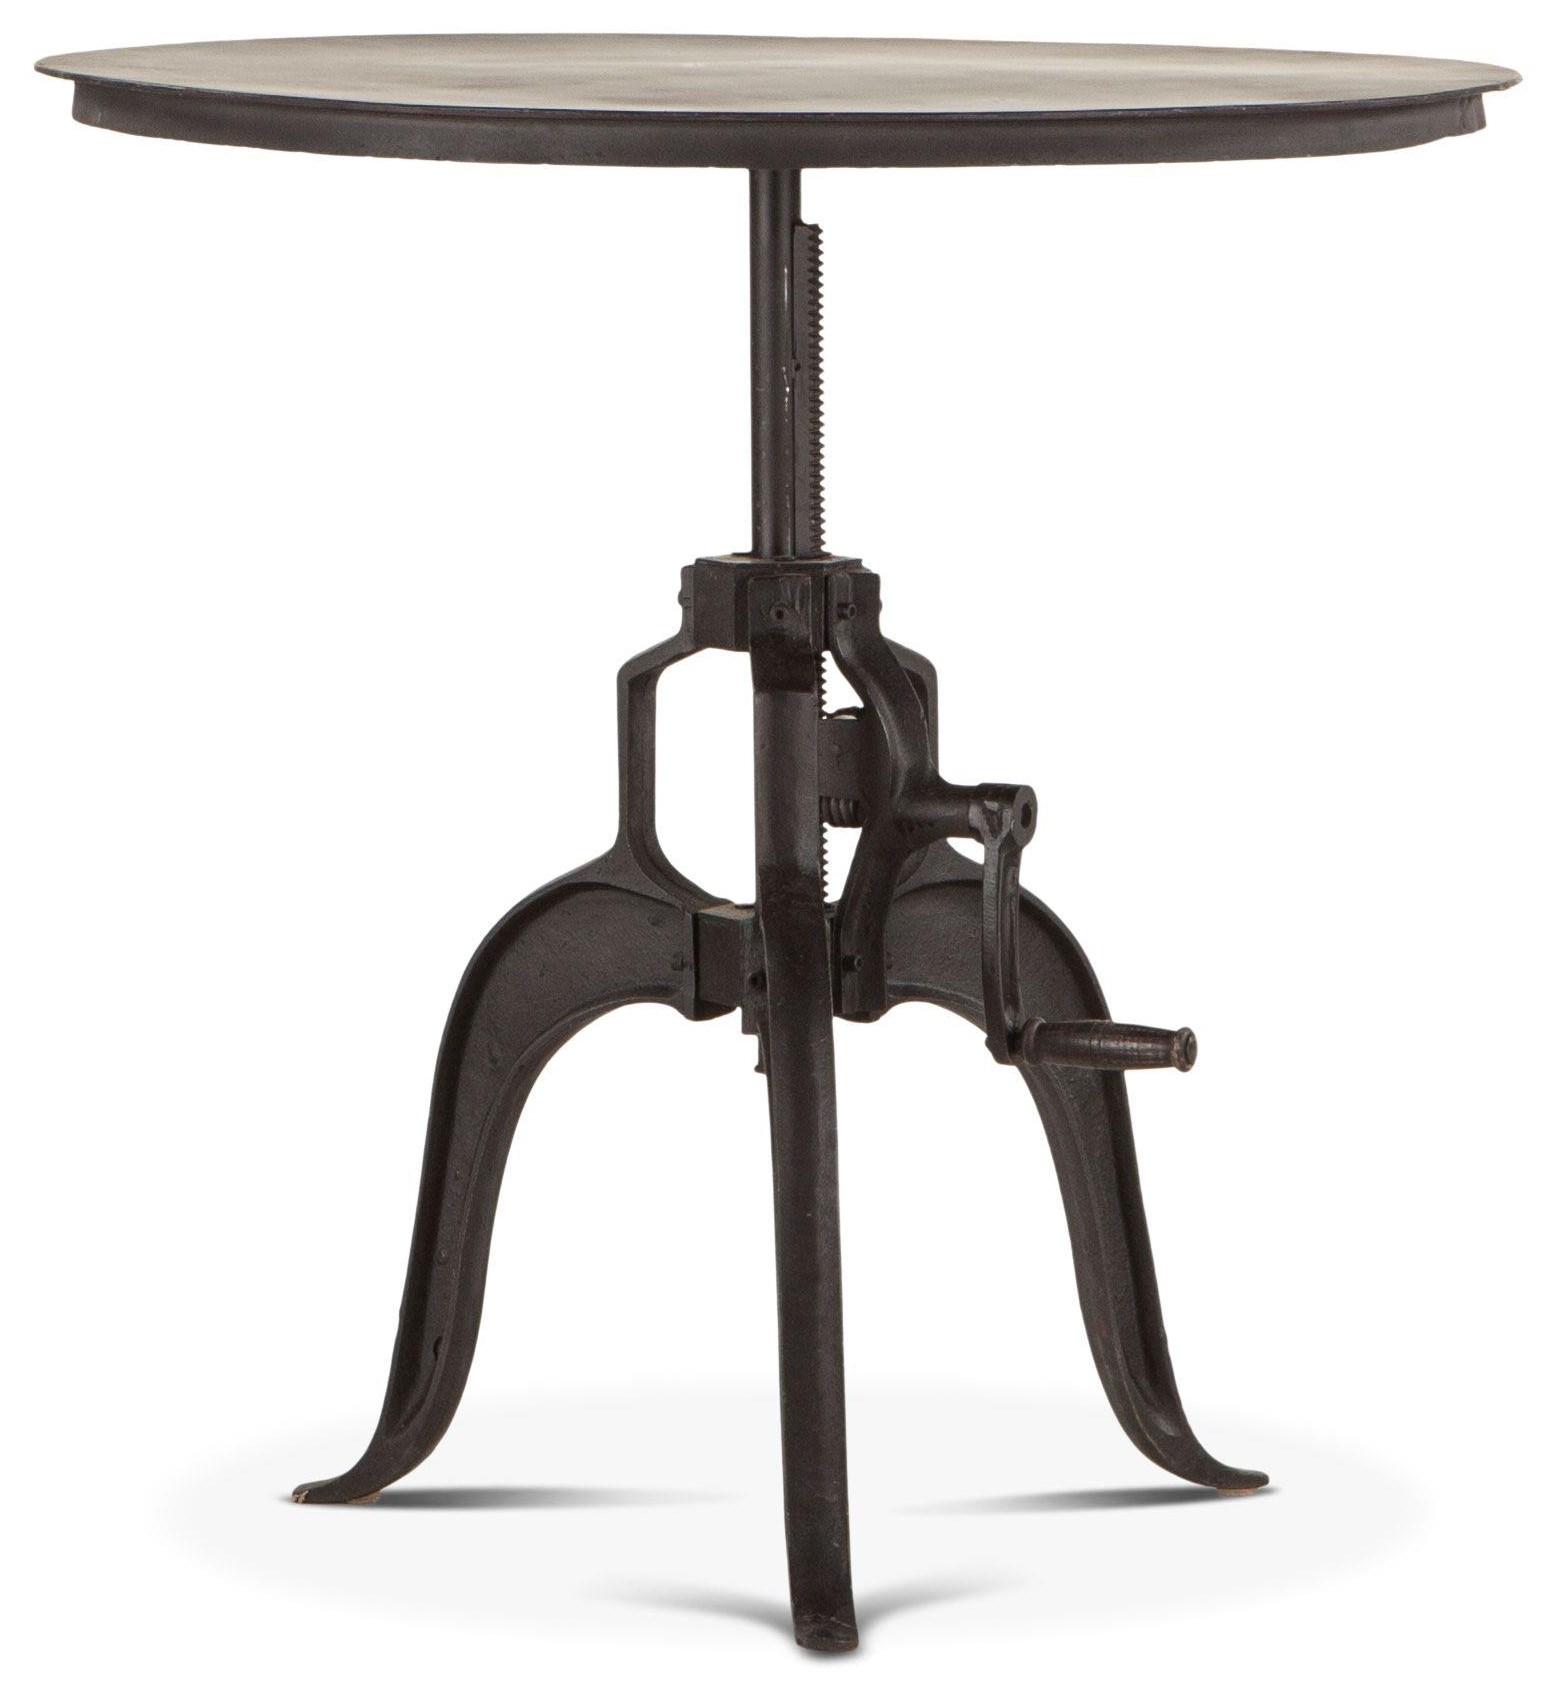 Beglobal Industrial Loft Metal Round Adjustable Base Table Belfort Furniture Pub Tables